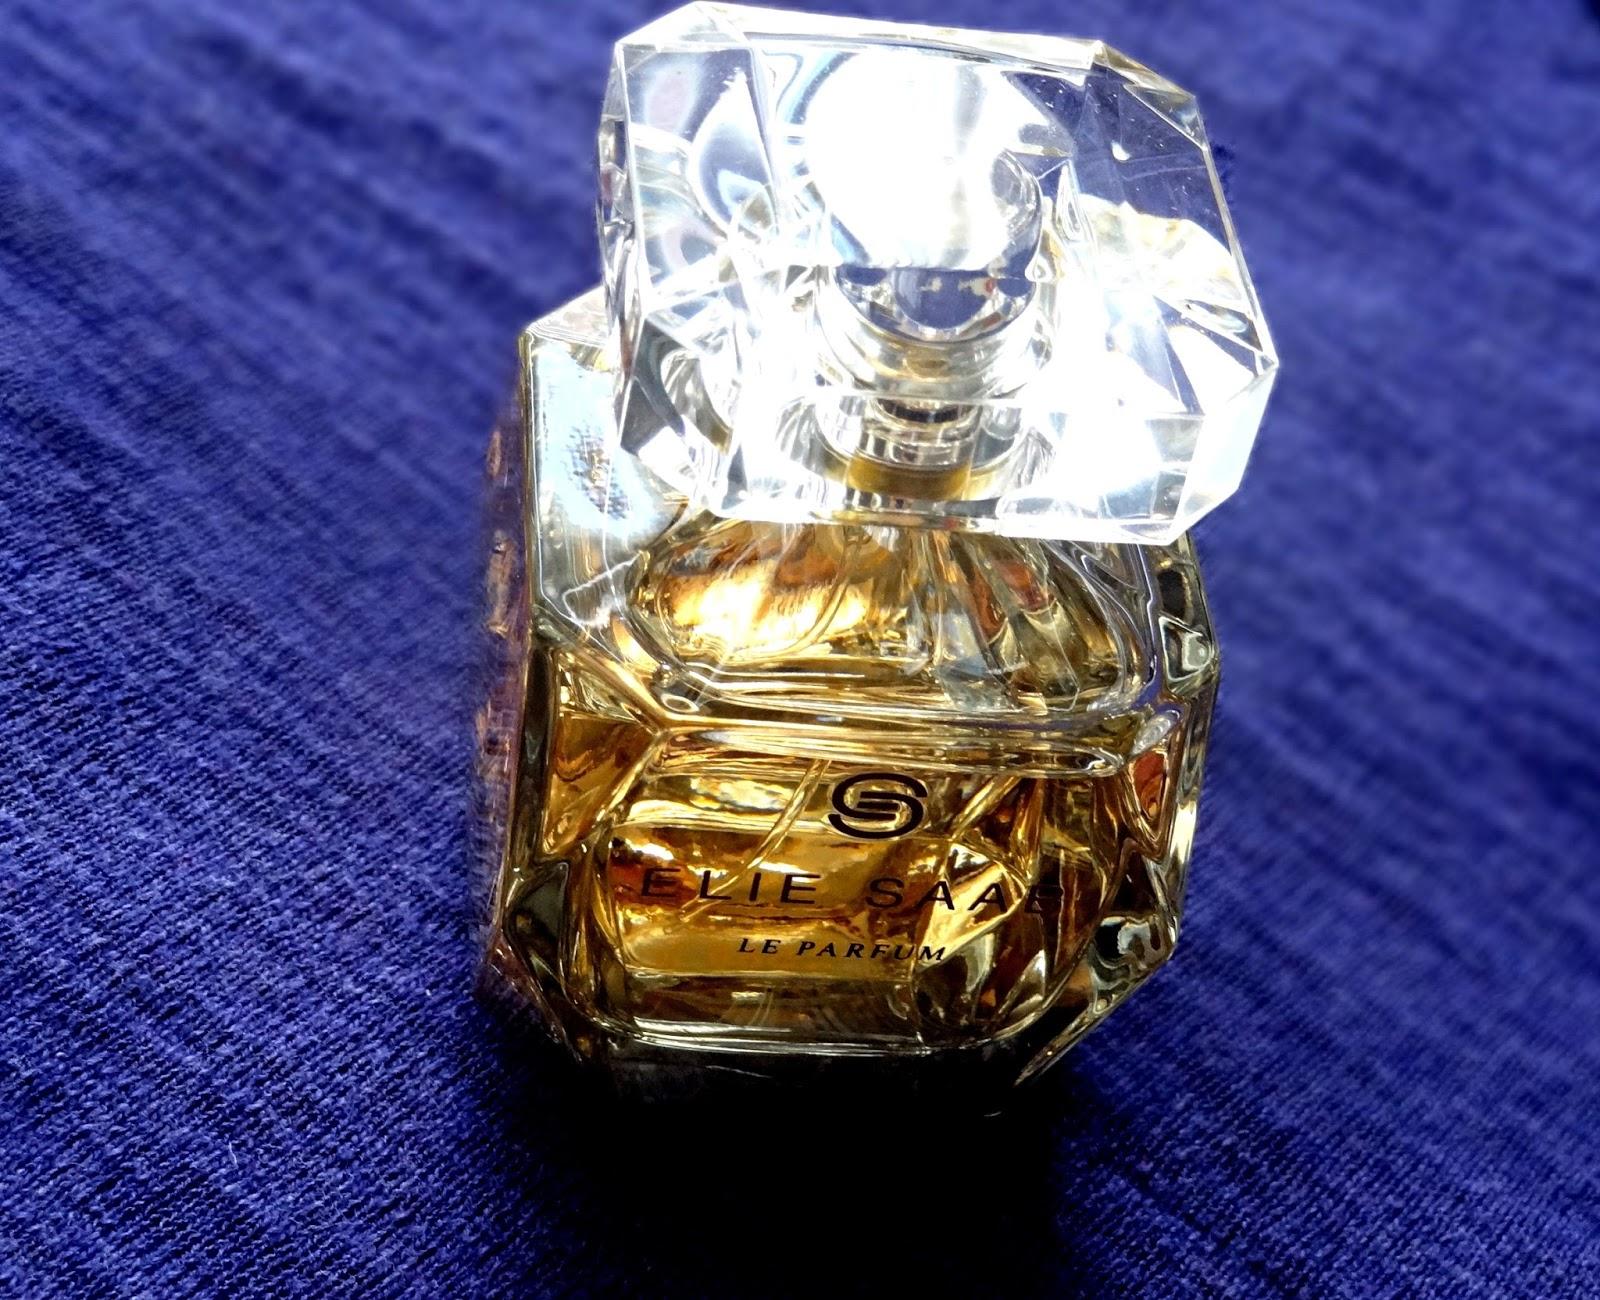 Elie Saab Le Parfum L'Edition Or